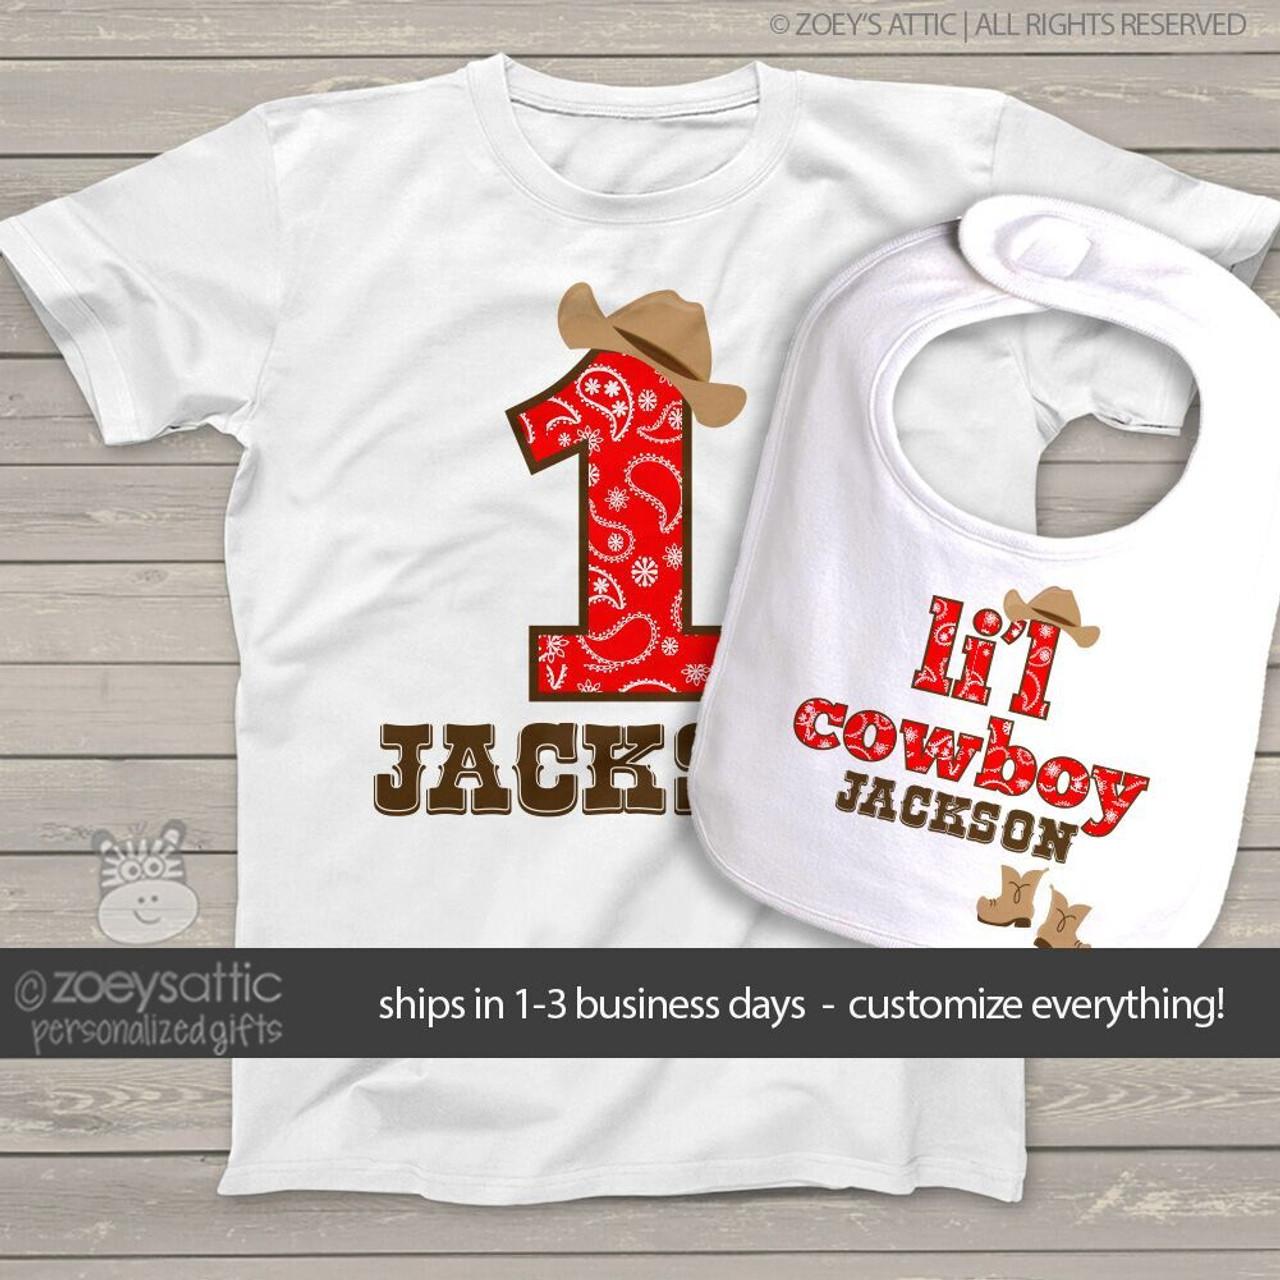 4aaf4f914c6 First birthday shirt cowboy or cowgirl buckaroo personalized Tshirt or  bodysuit and bib matching set